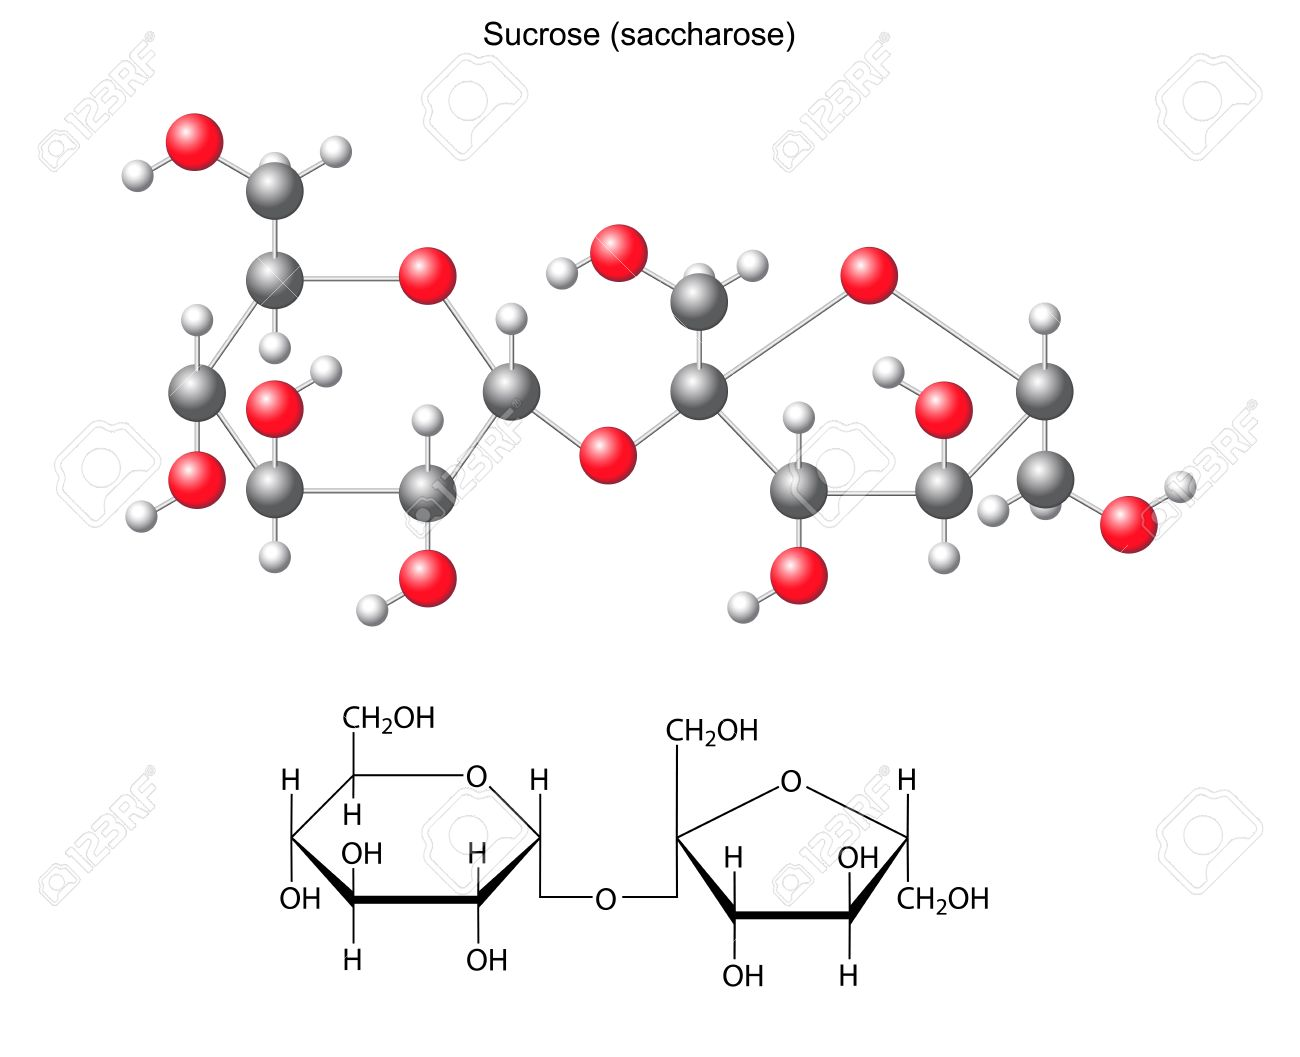 Structural chemical formula and model of sucrose saccharose - 29306148